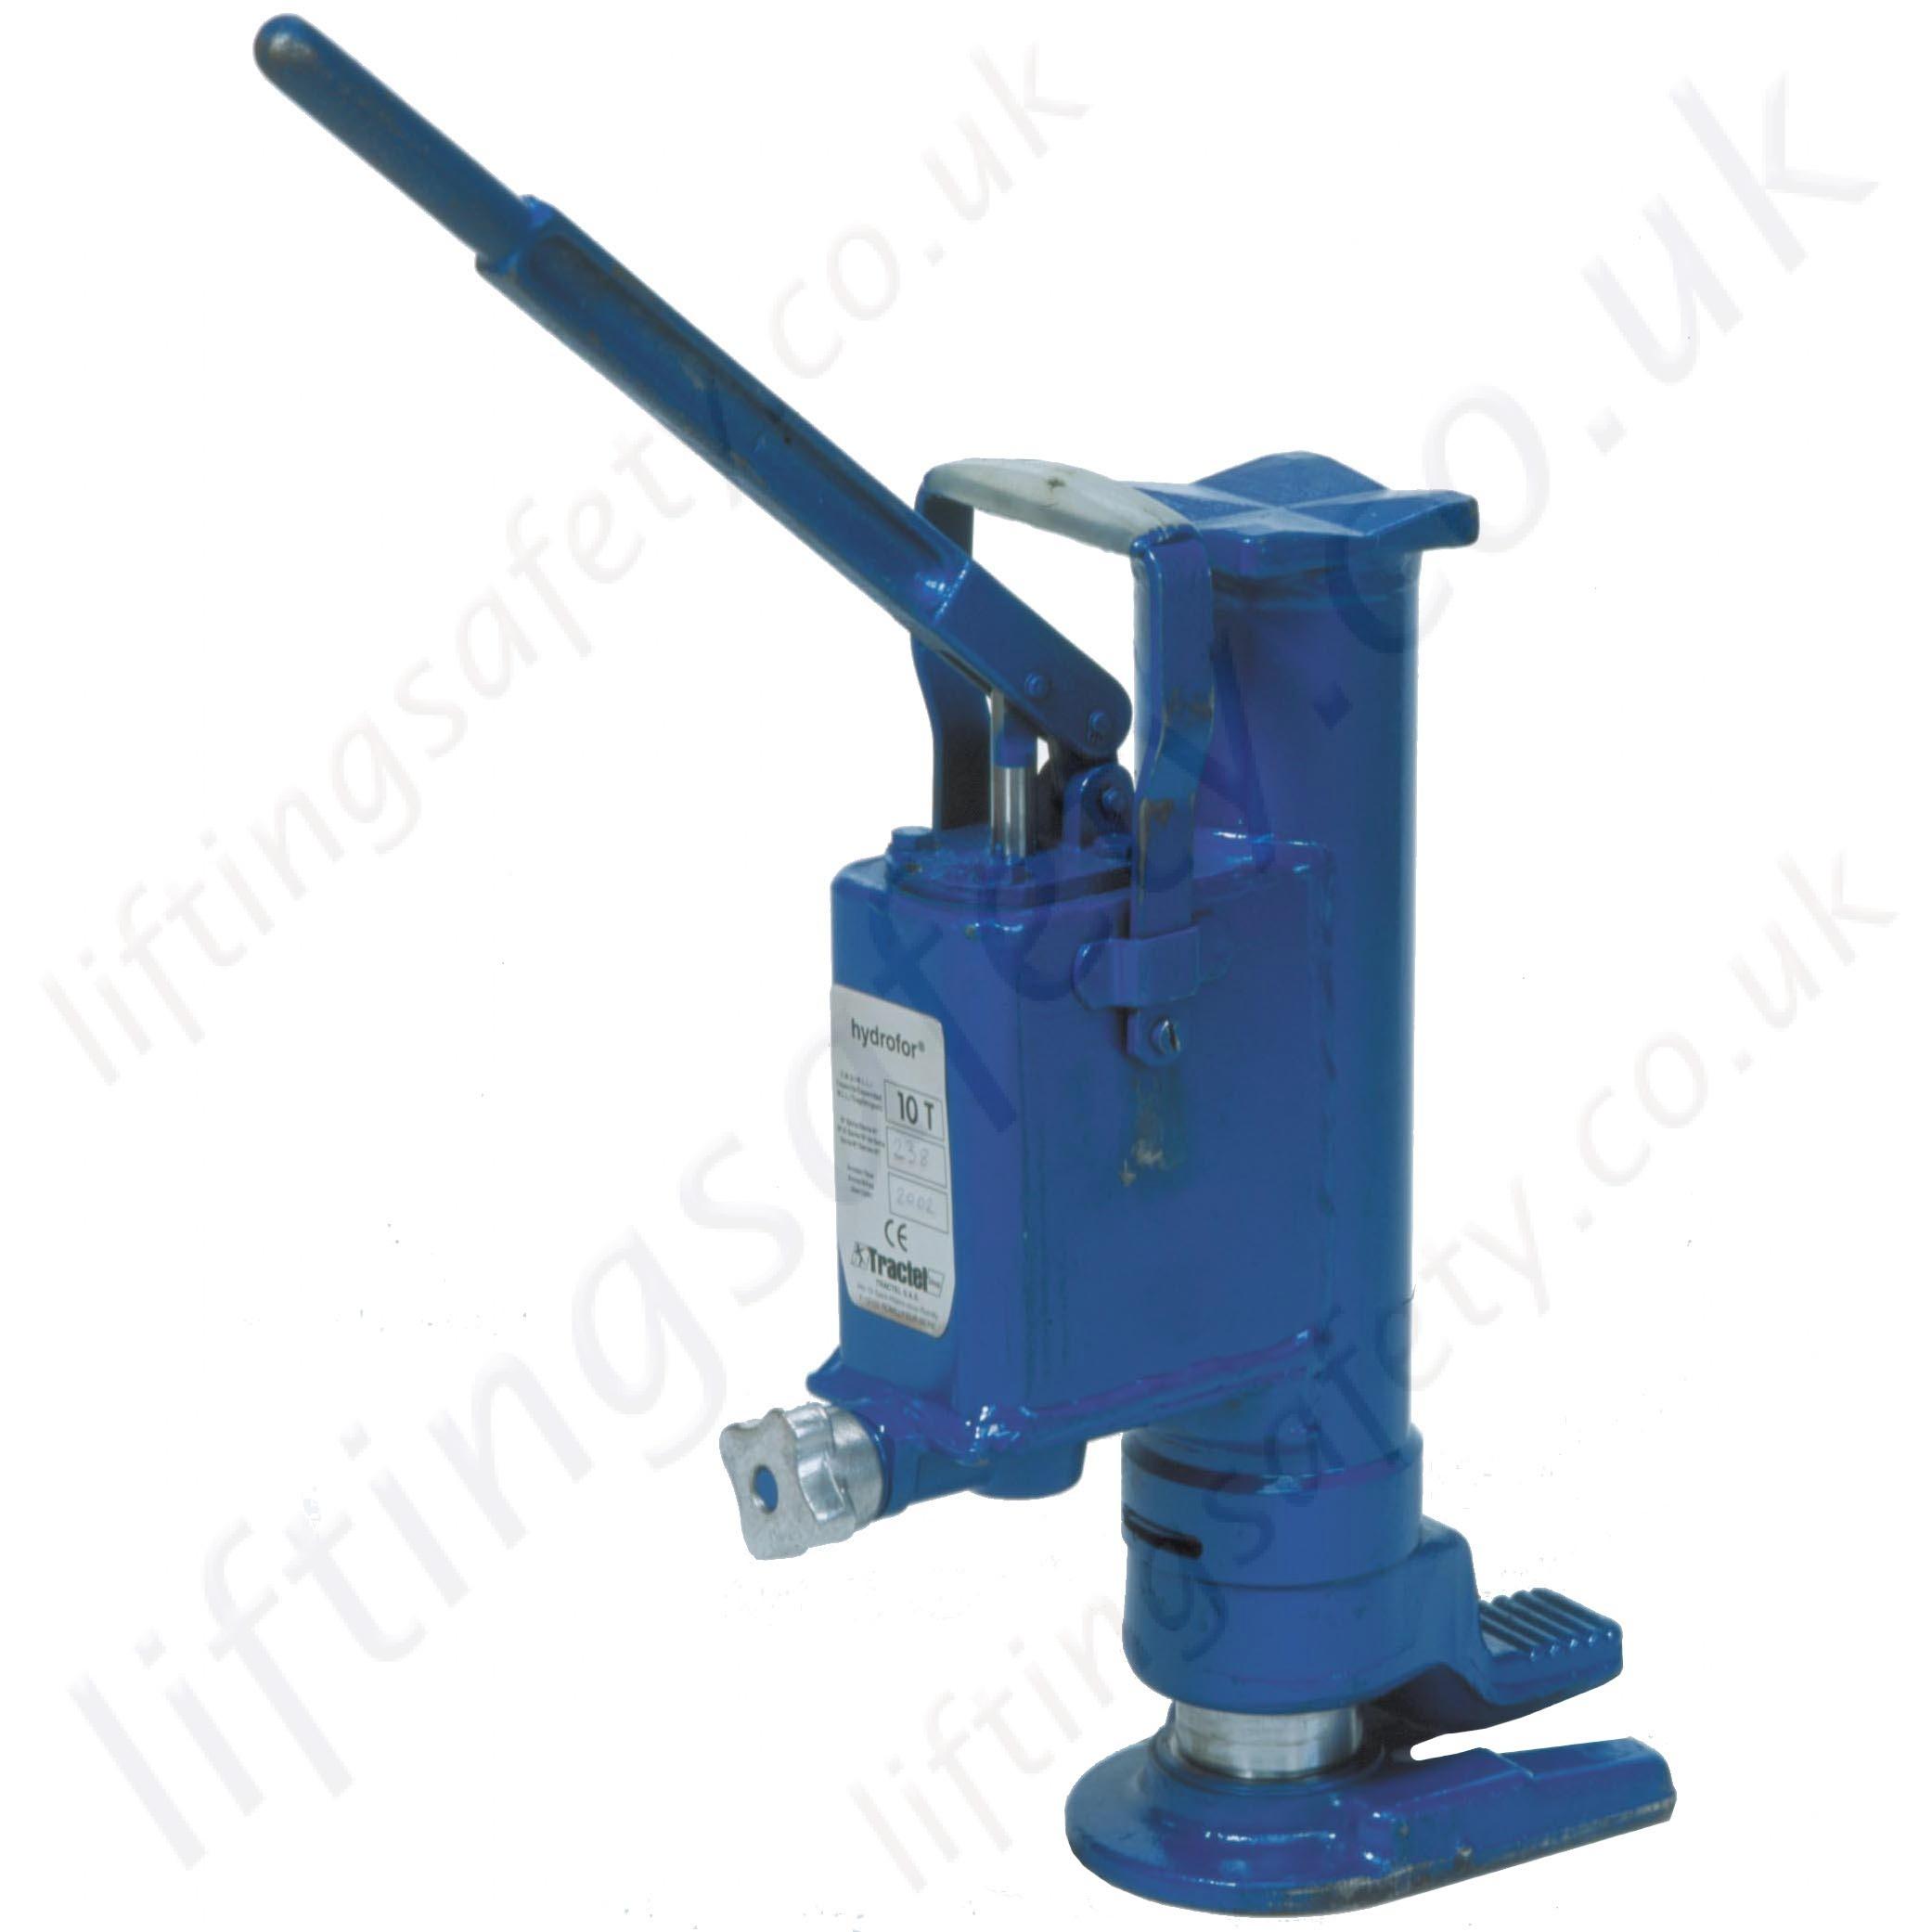 Tractel Hydrofor Hydraulic Toe Jacks Range From 5000kg